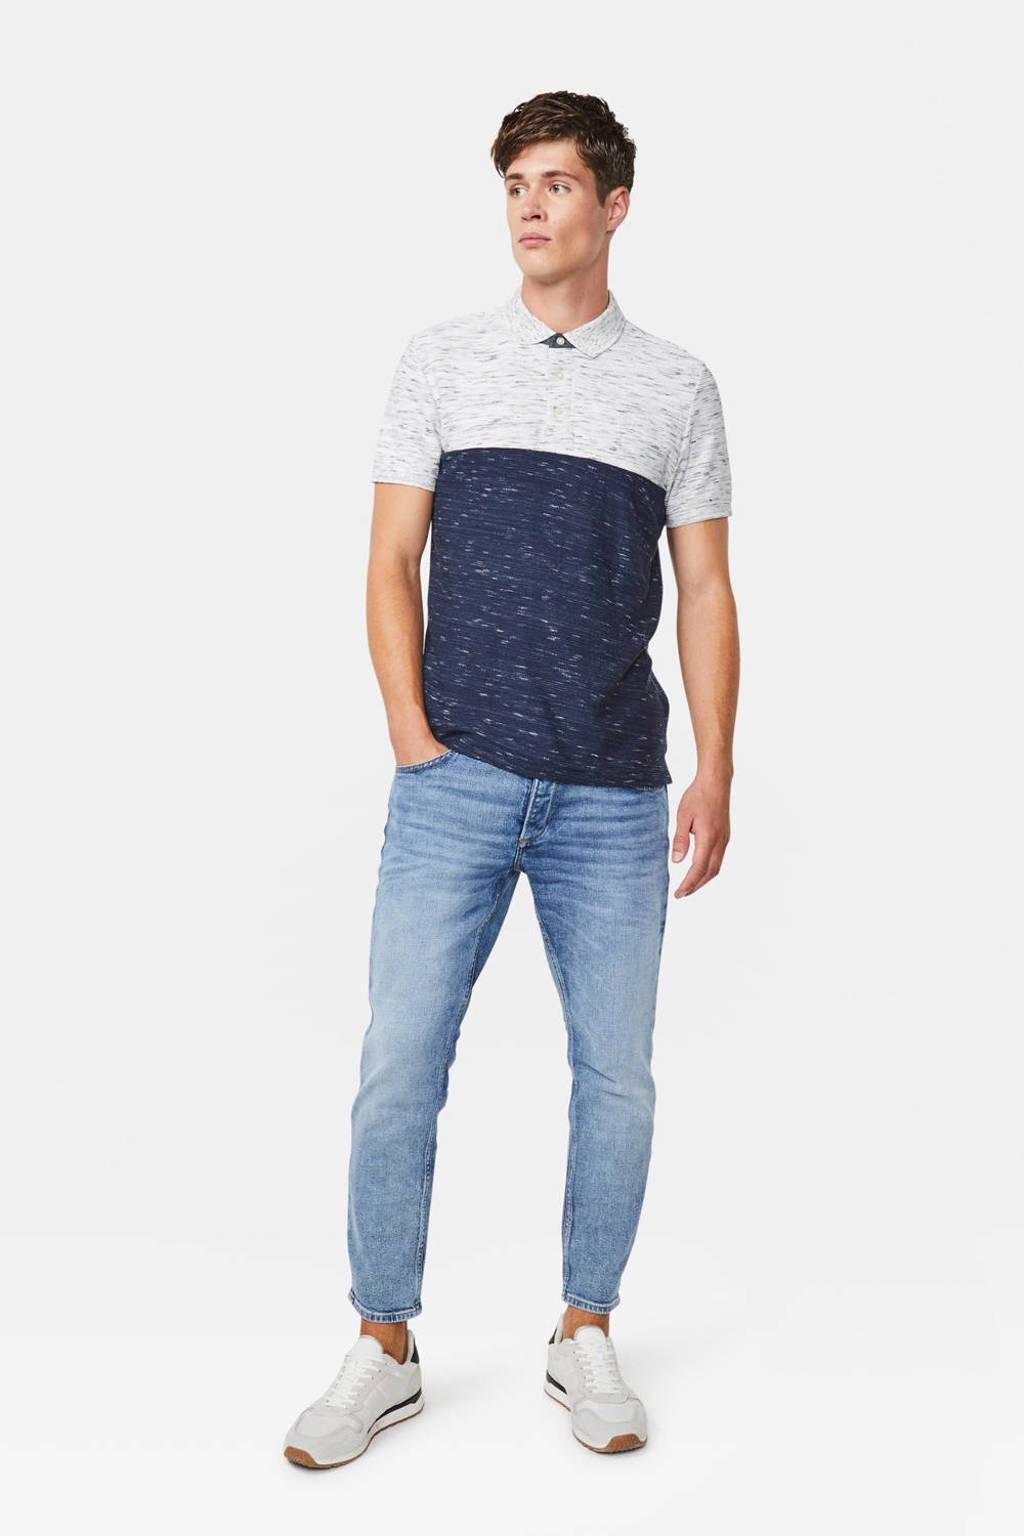 WE Fashion gemêleerd T-shirt donkerblauw/grijs, Donkerblauw/grijs